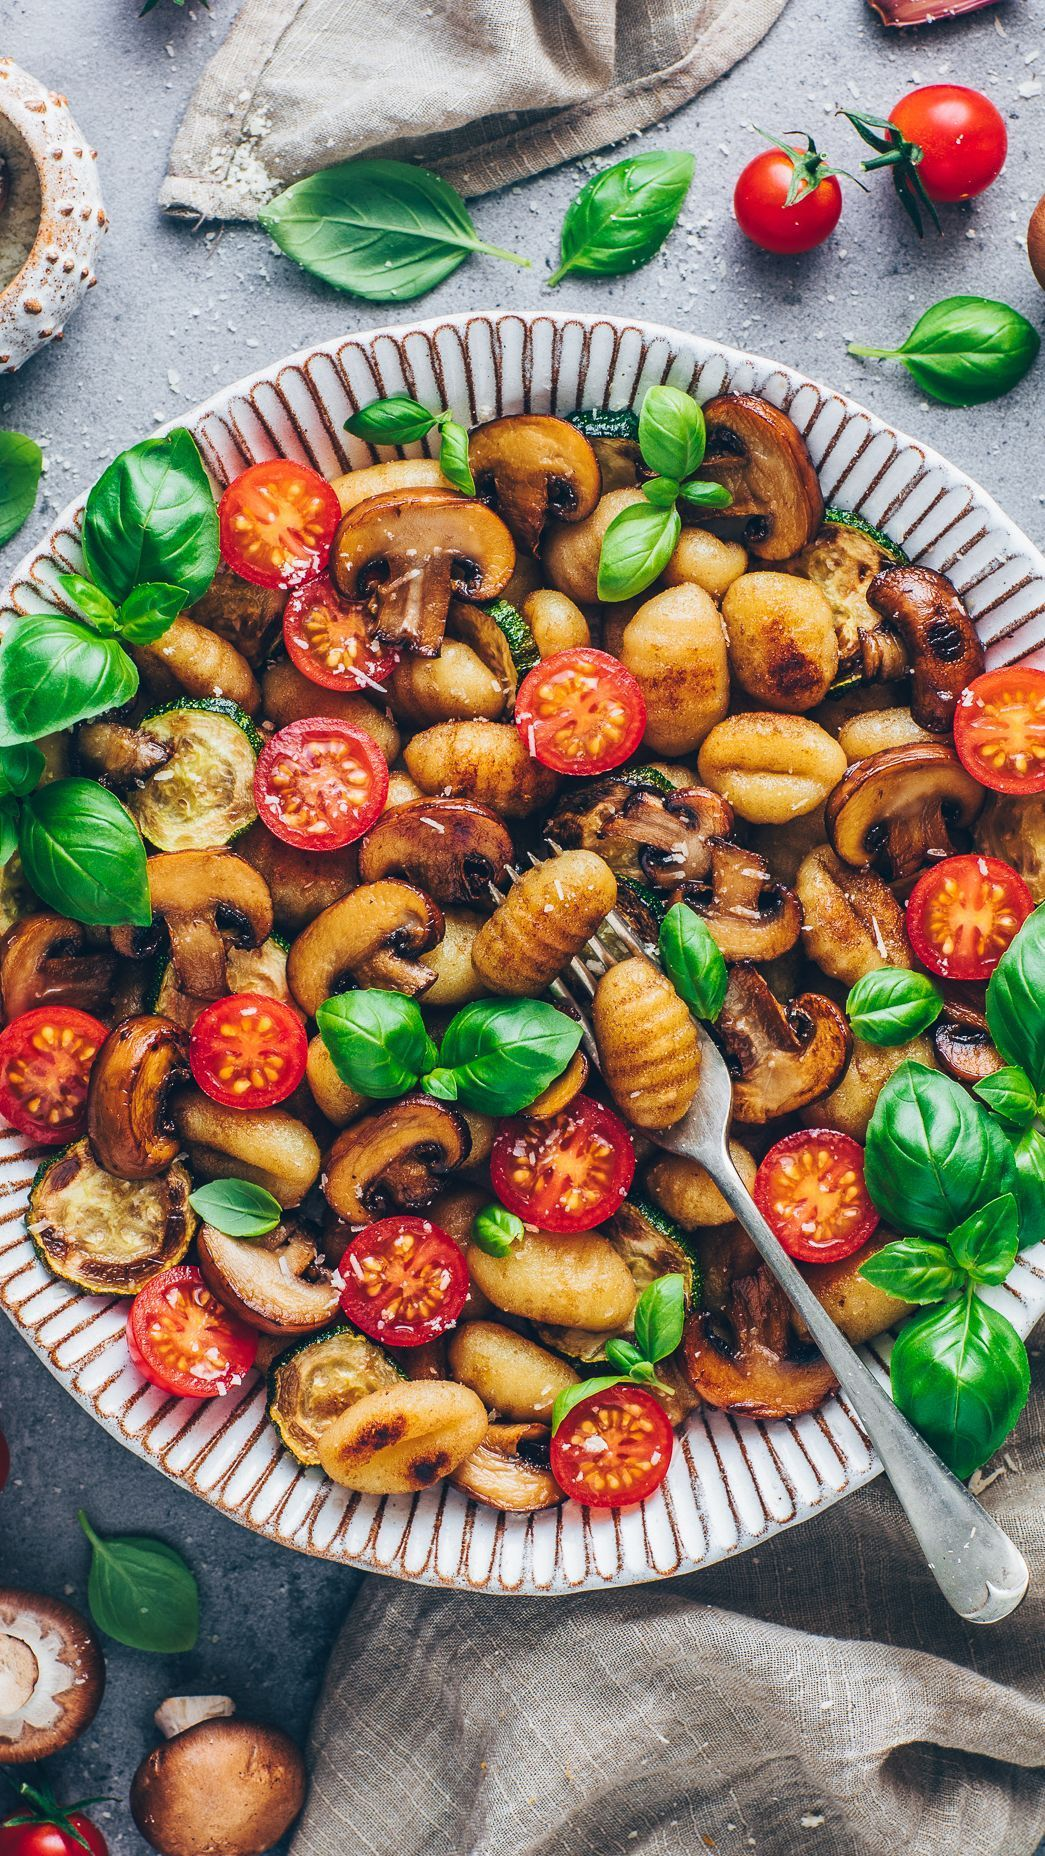 Crispy Gnocchi vegetable stir-fry - Gnocchi Rezept Vegan